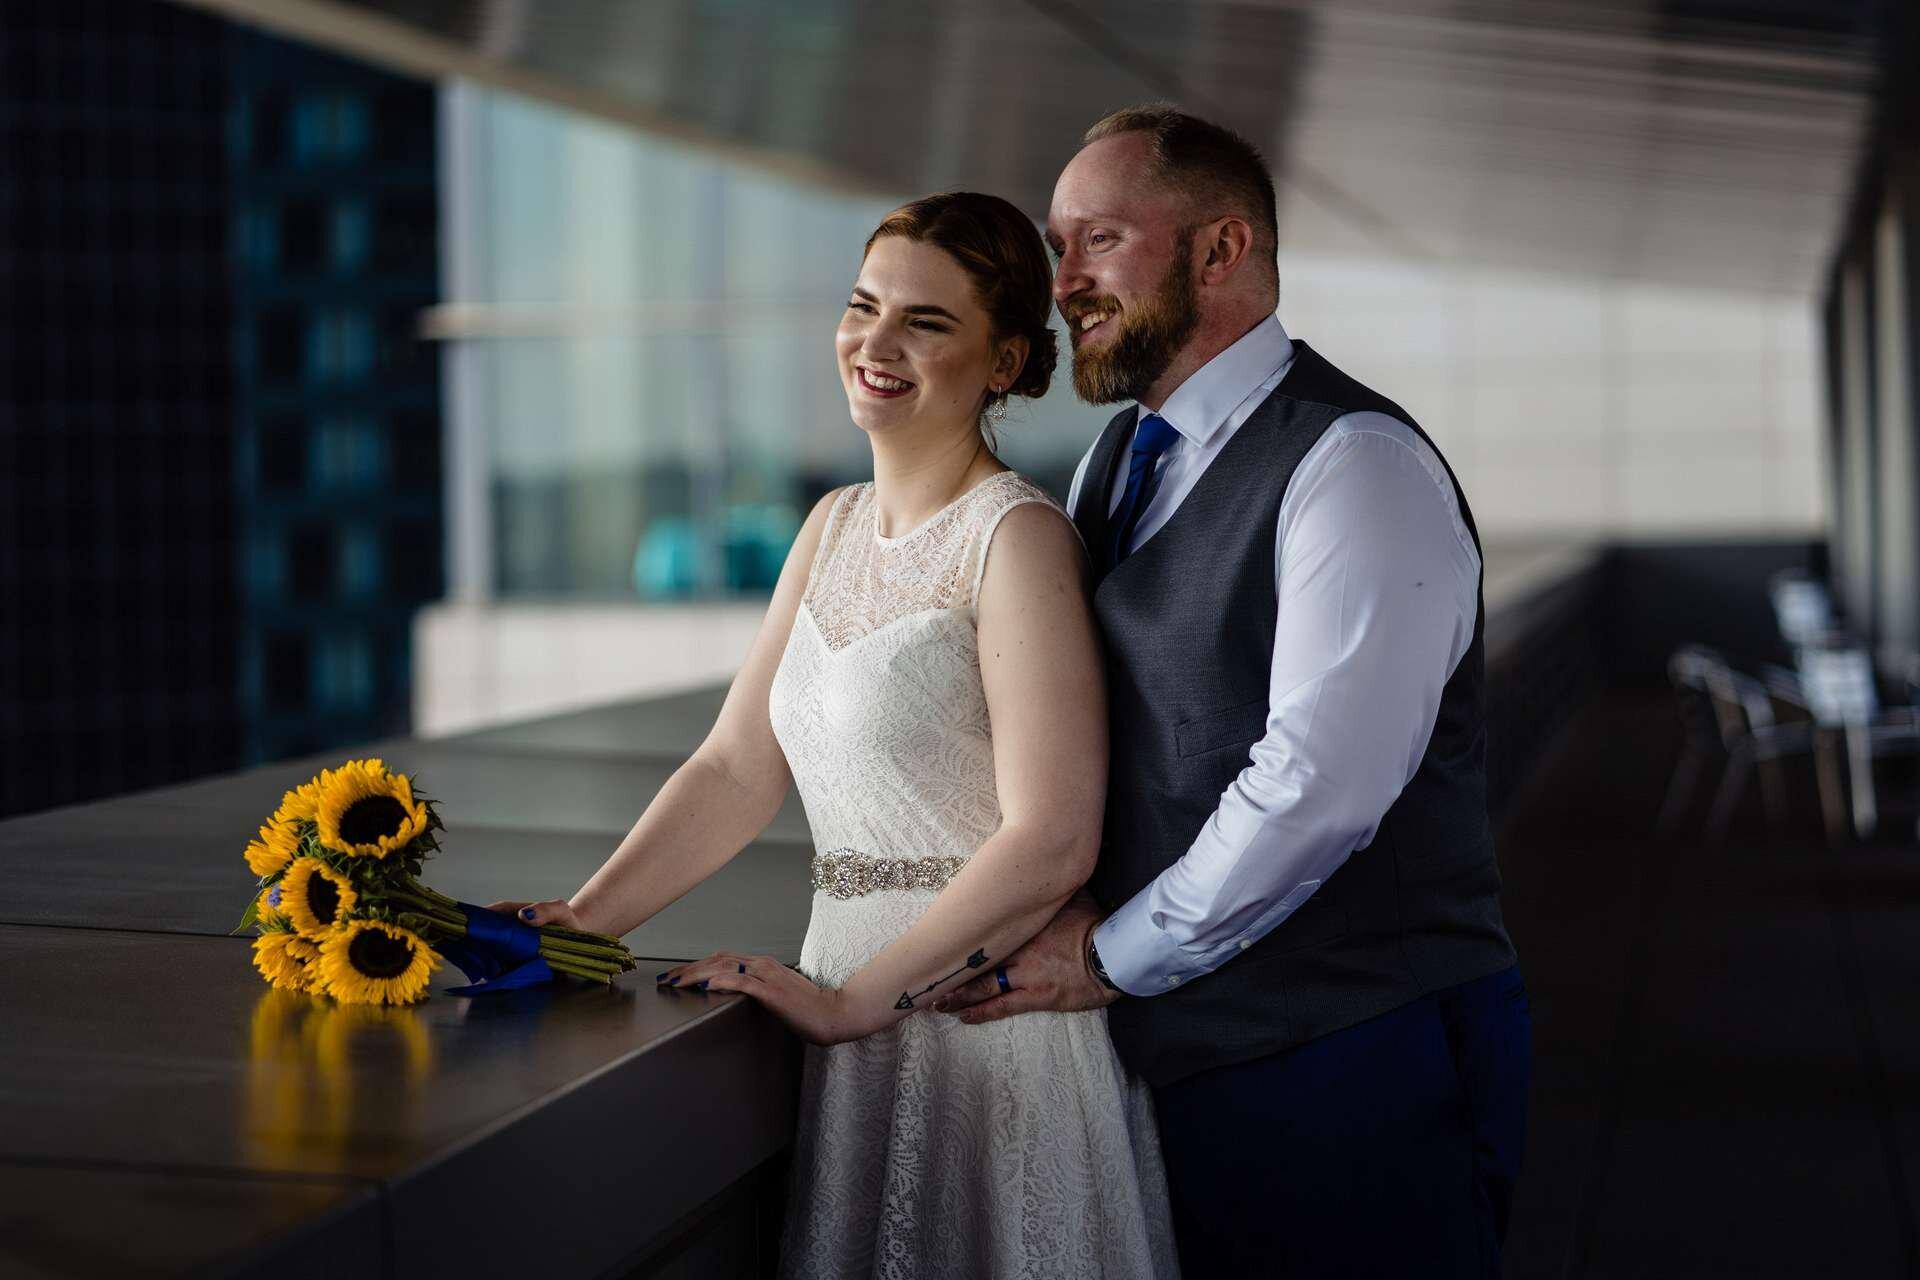 247-seattle-elopement.jpg